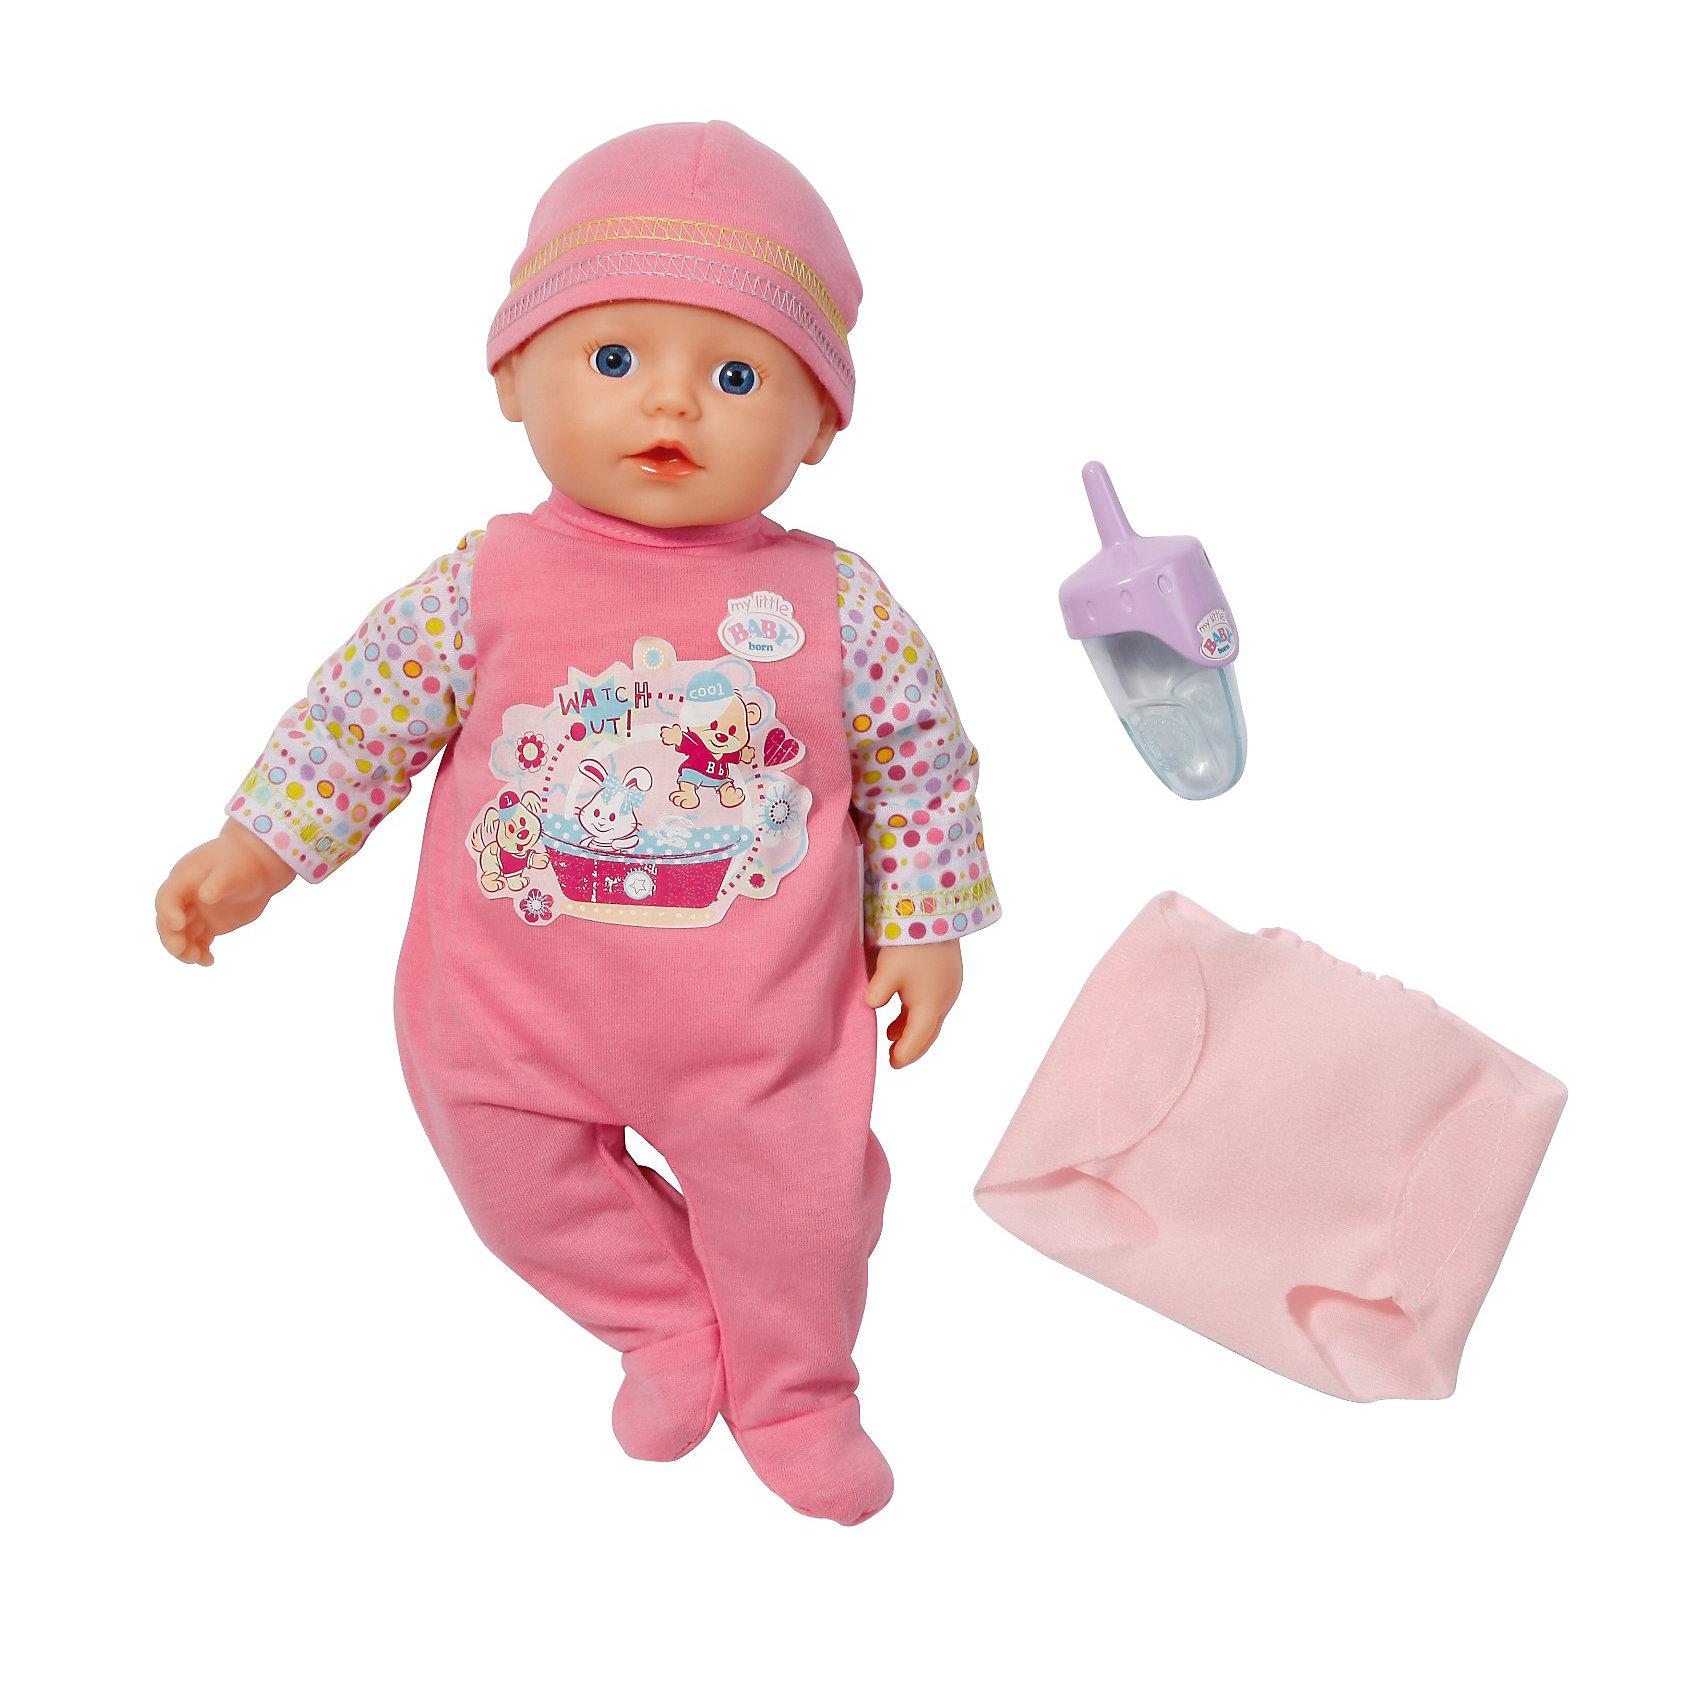 Кукла Быстросохнущая, 32 см, my little BABY born